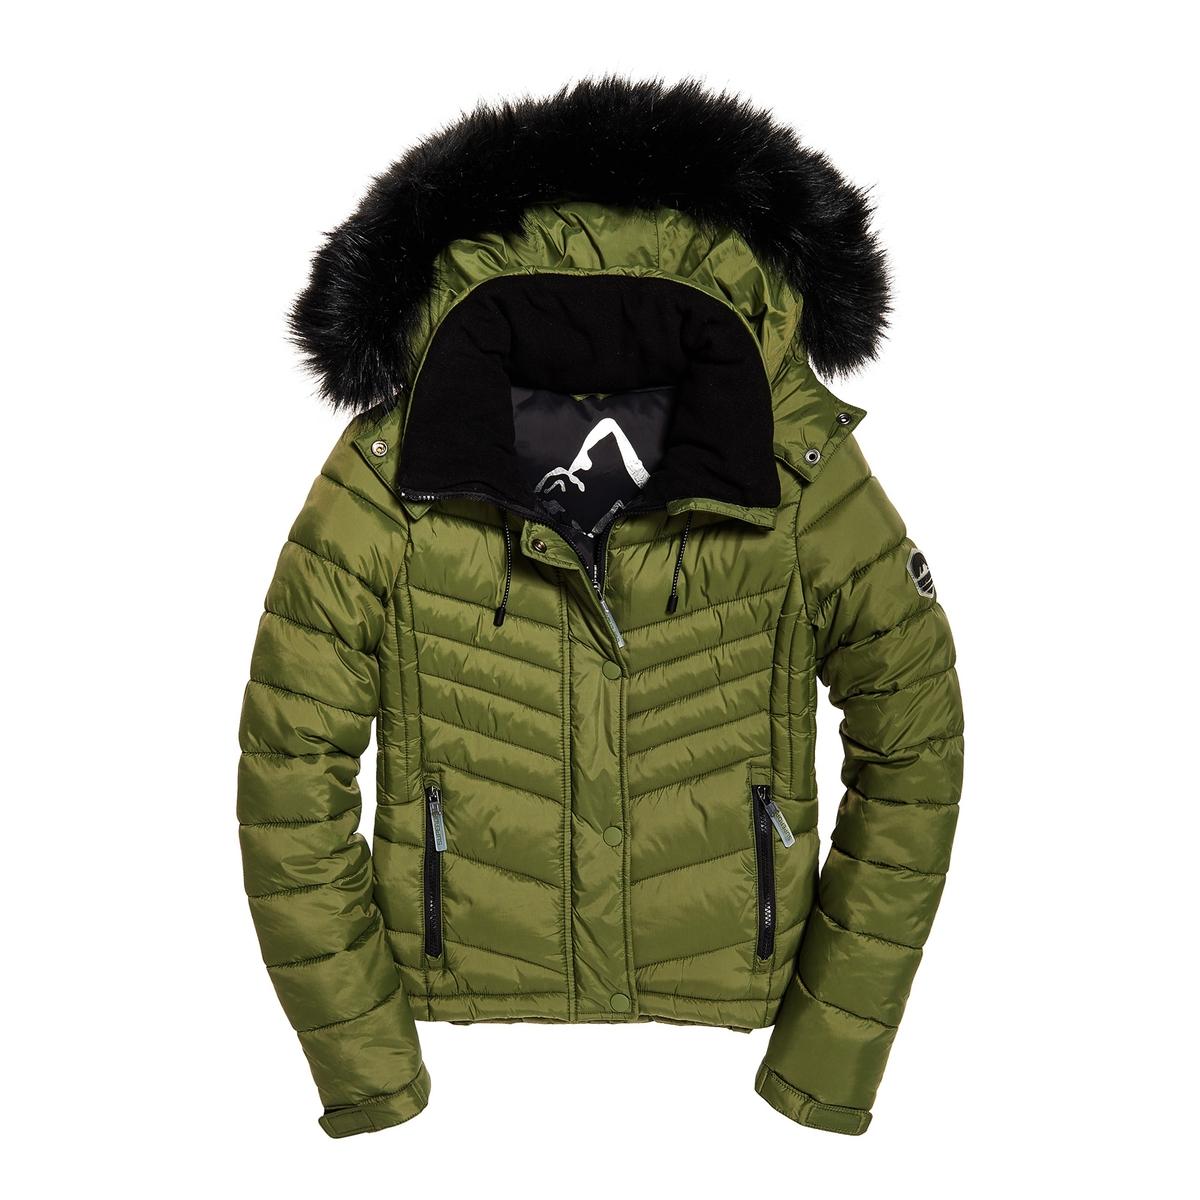 Chaqueta acolchada Fuji Slim 3 en 1 Jacket